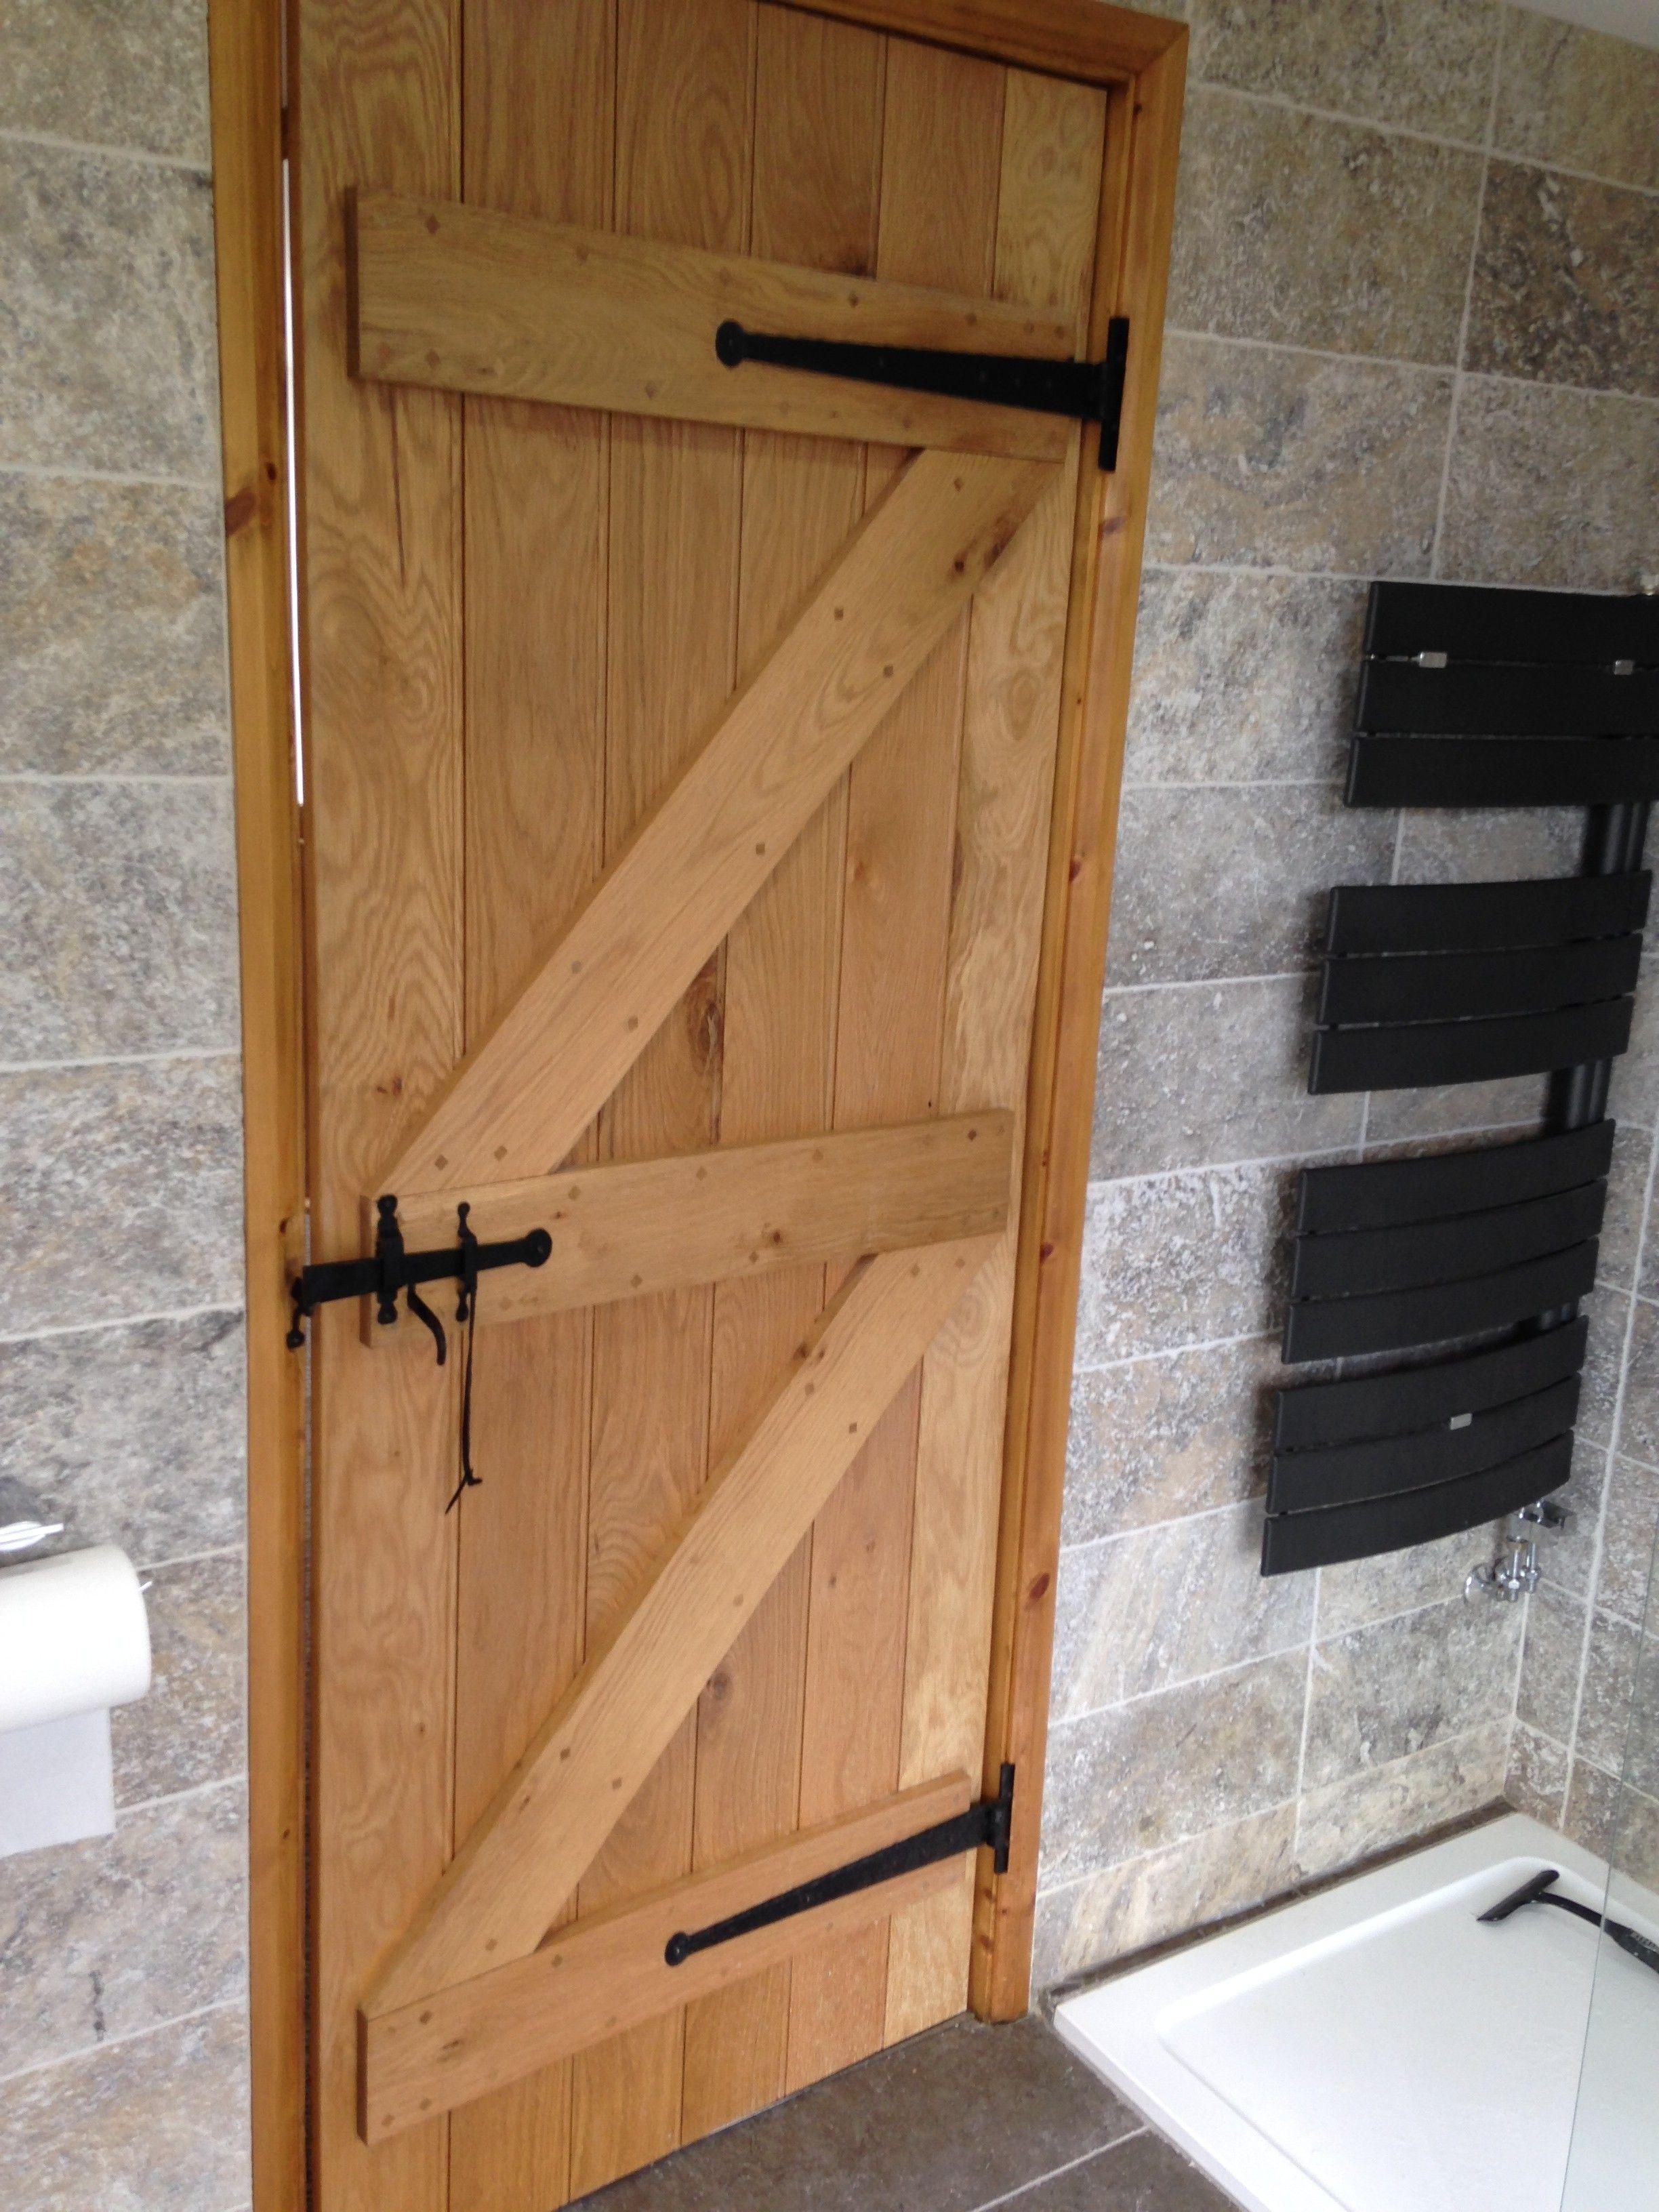 Ledge and brace oak doors - Solid Oak Ledge Brace Doors Oak Barn Door